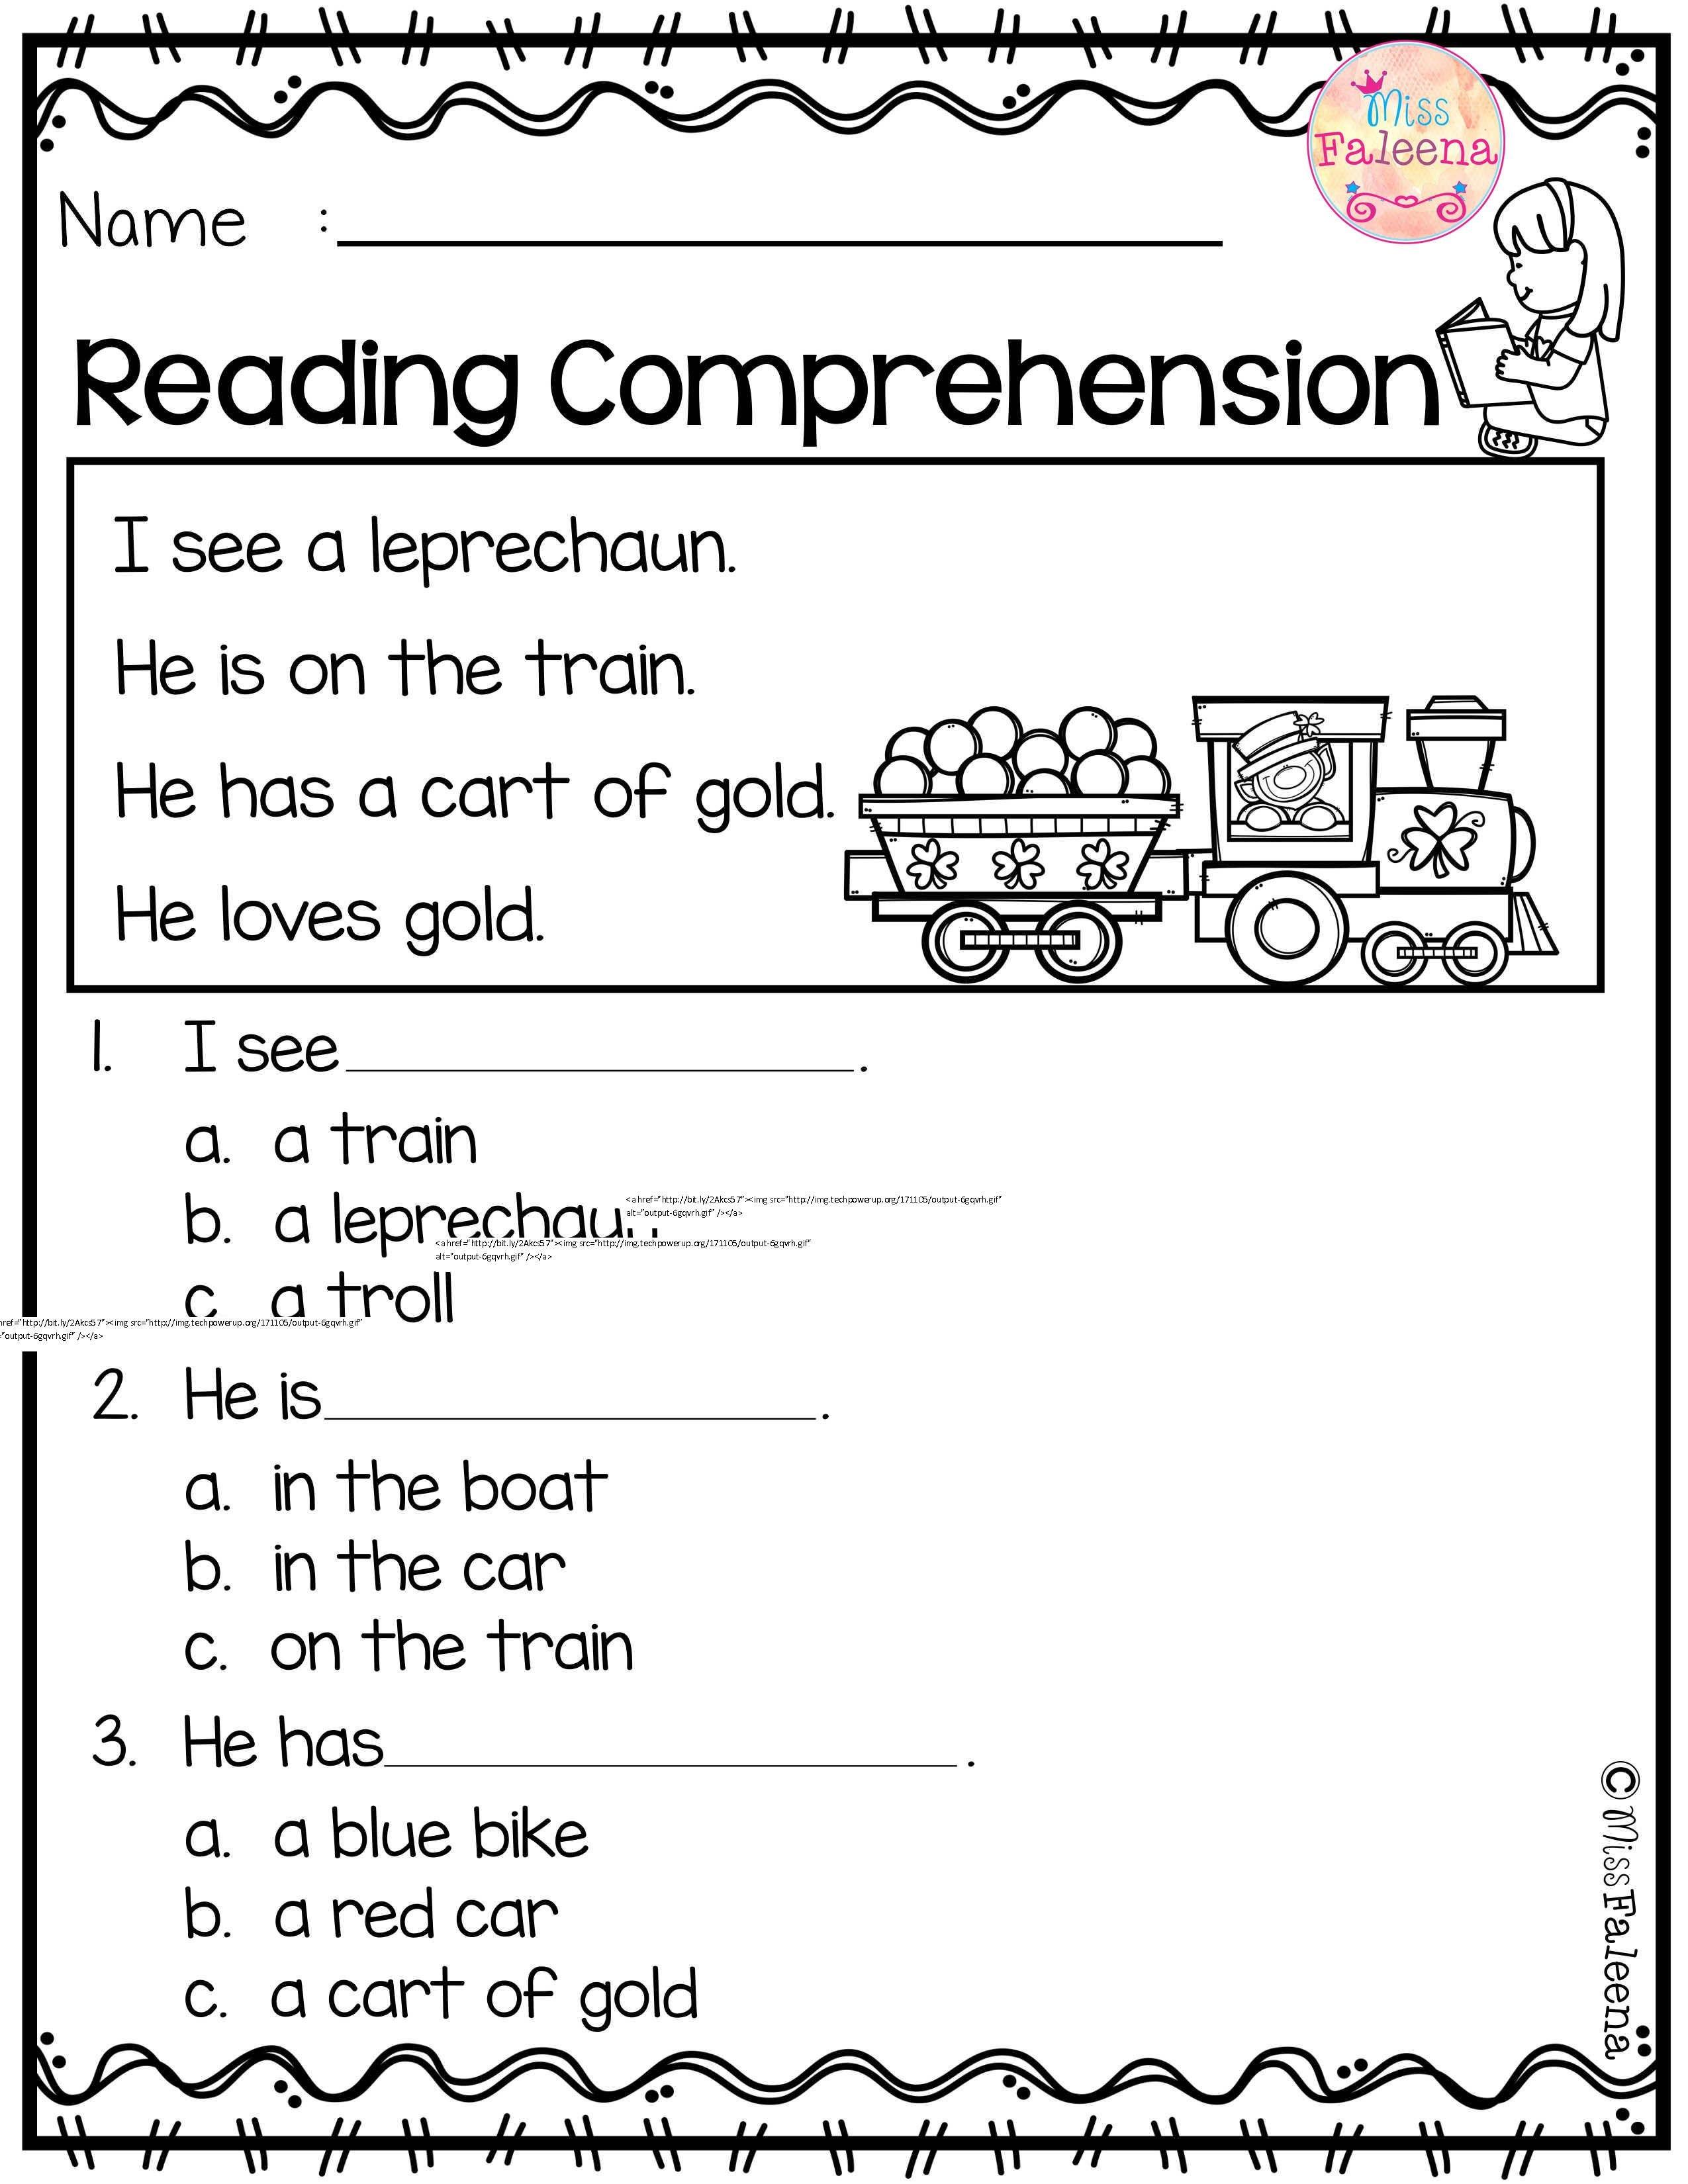 Kindergarten Free Games Printable Tracing Sheets Halloween Stuff Pertaining To Kindergarten Reading Printable Worksheets